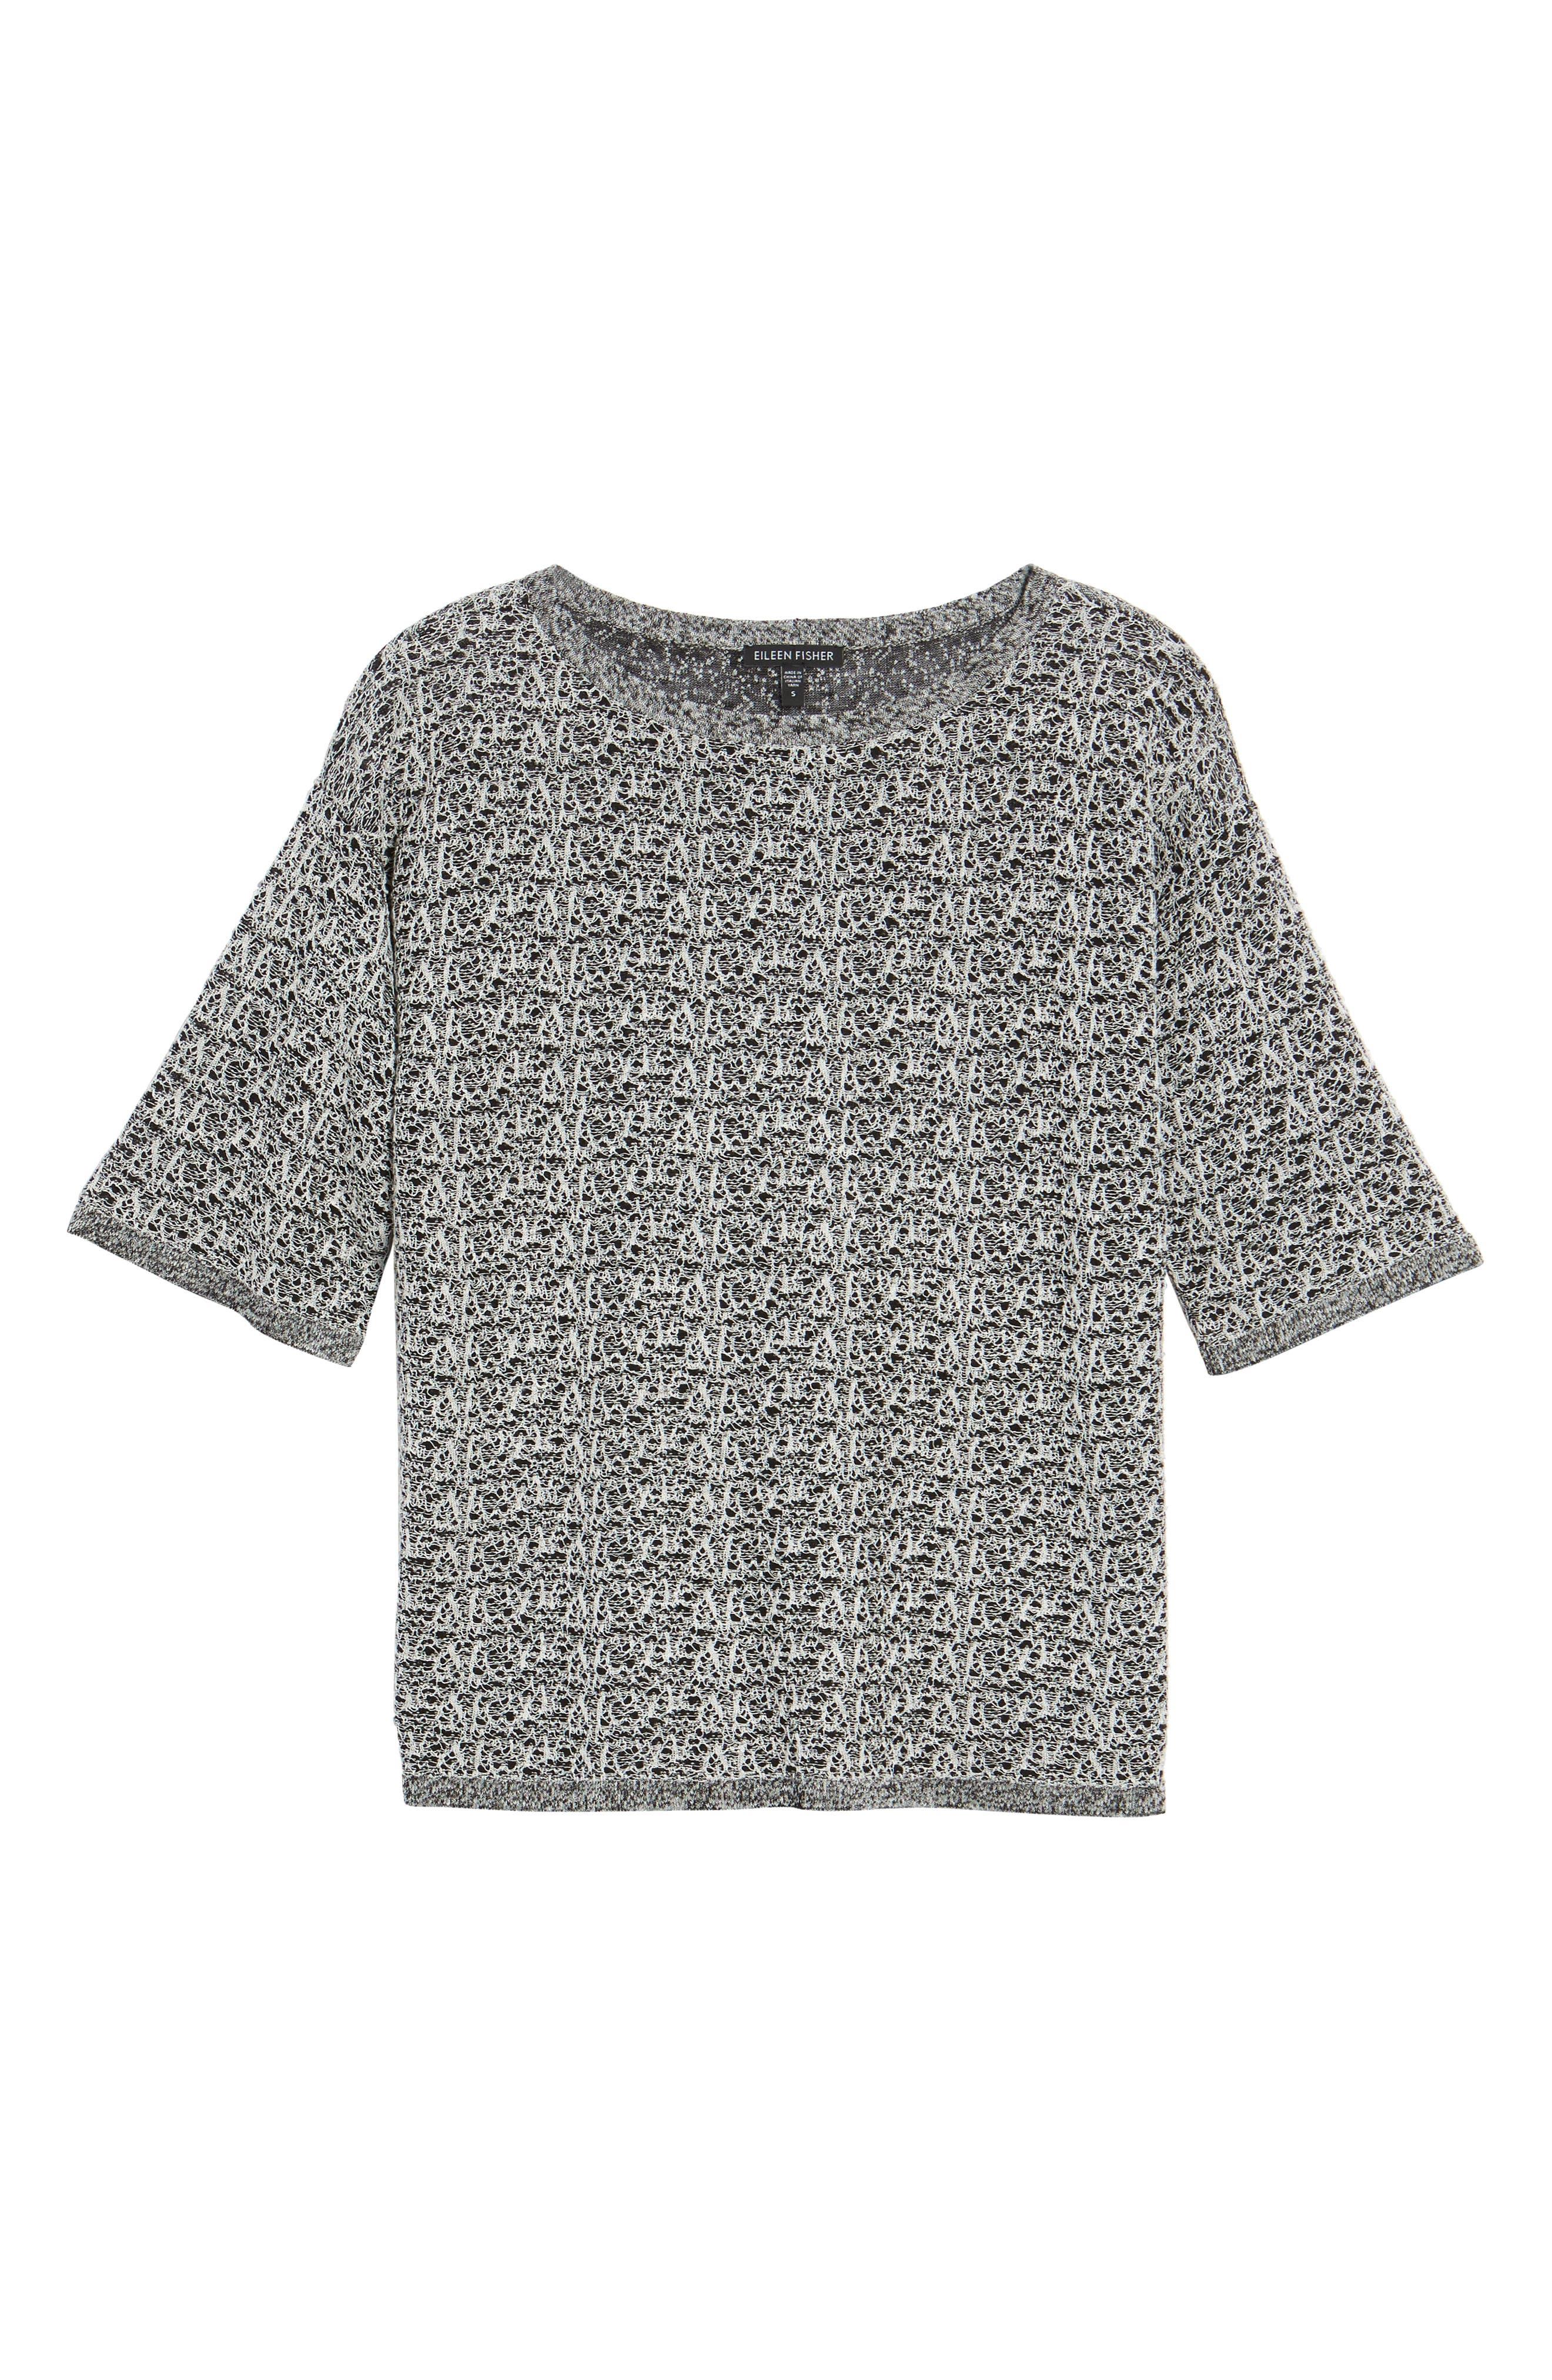 Organic Linen Blend Knit Top,                             Alternate thumbnail 6, color,